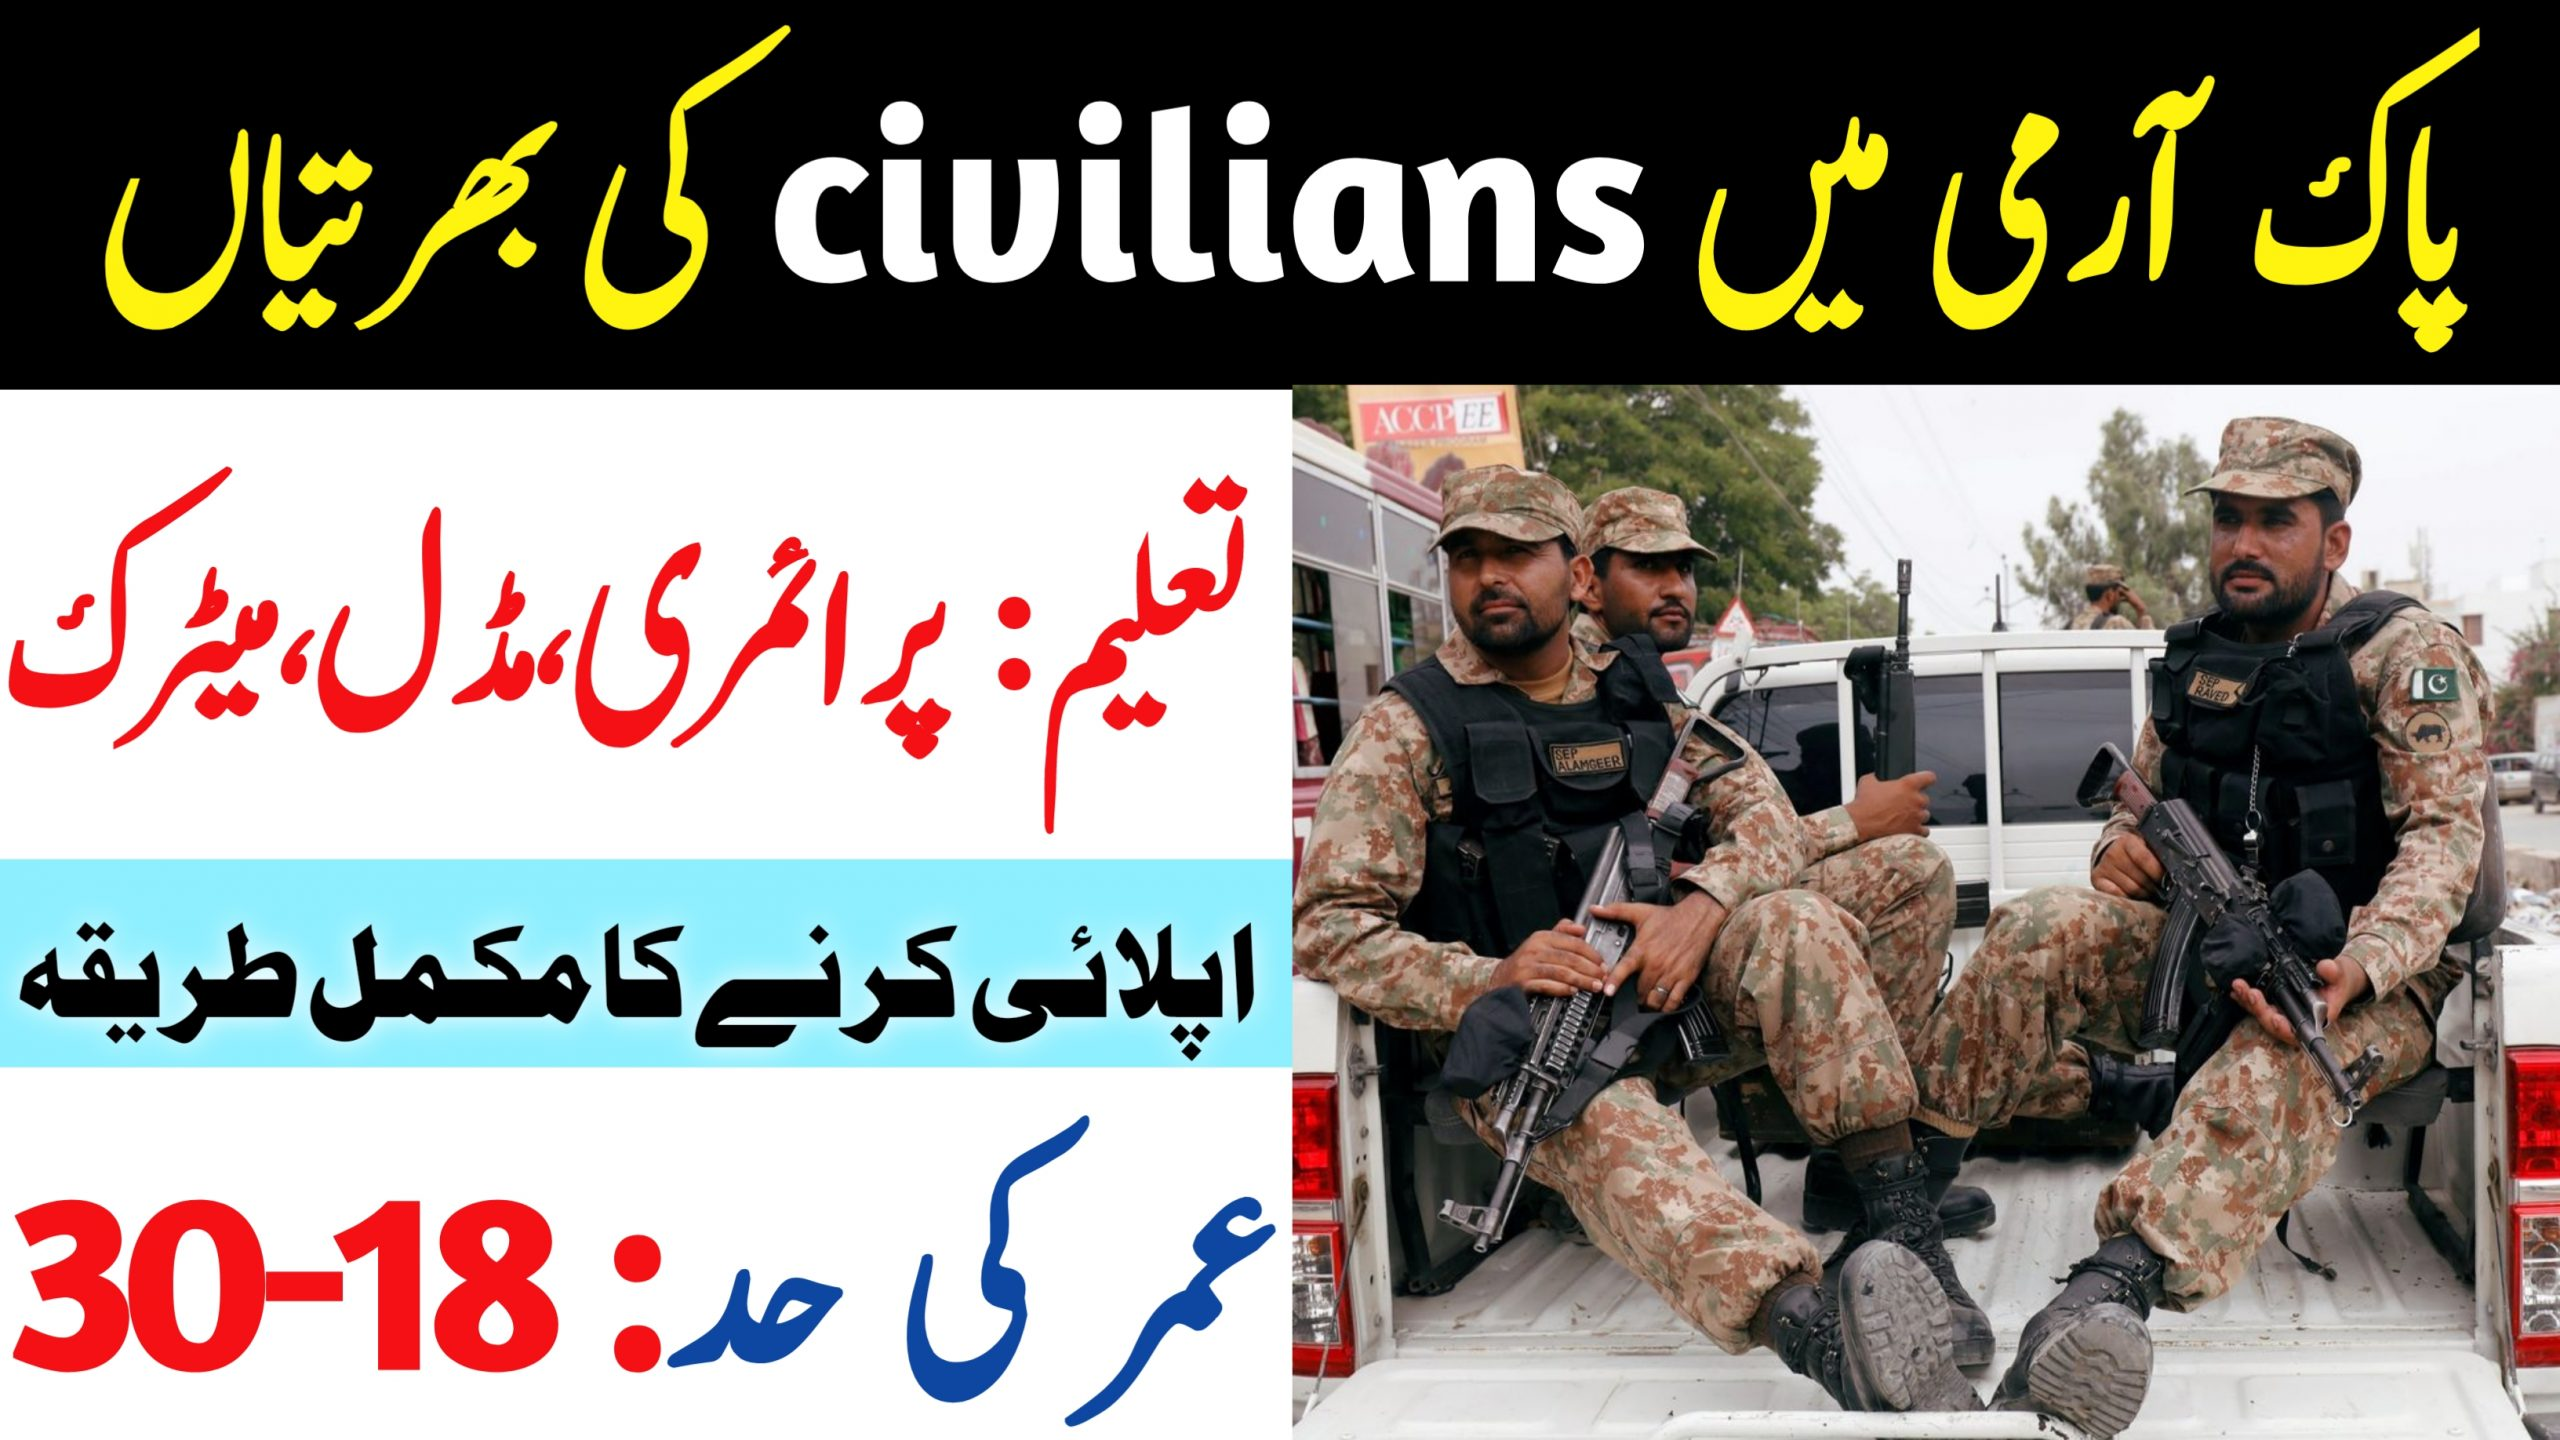 Army Civilian jobs 2021